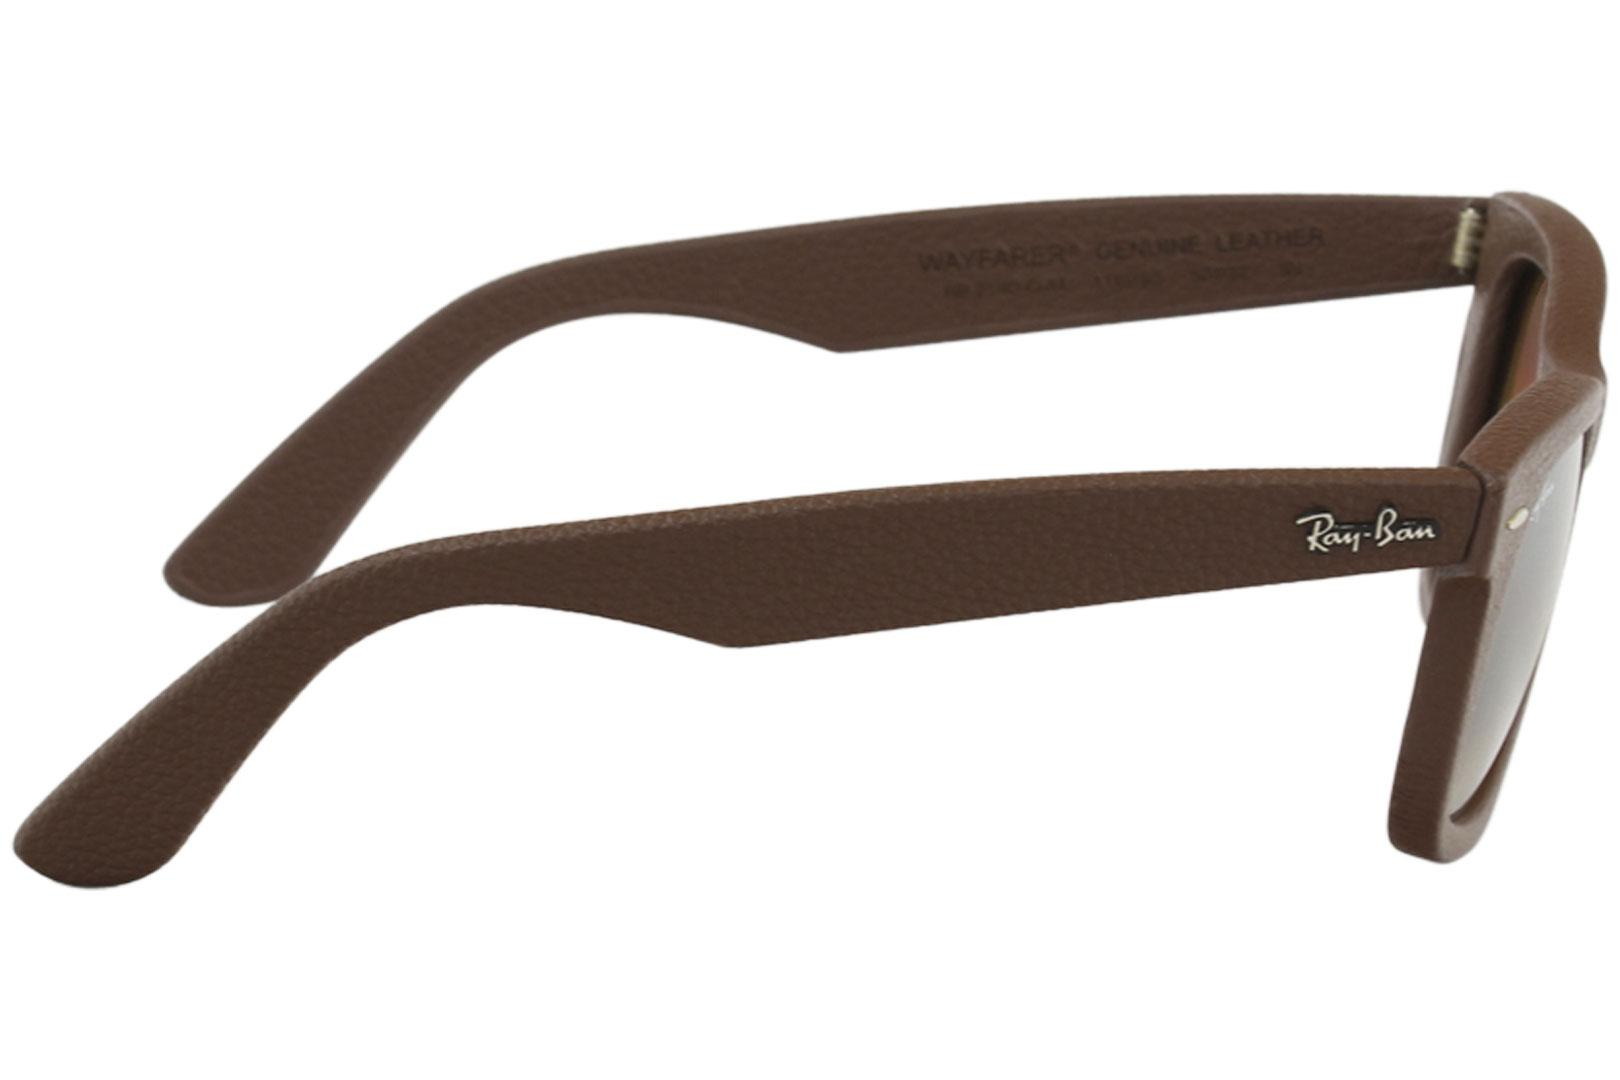 498387bfa5 Ray Ban 2140QM 2140 QM RayBan Wayfarer Leather Sunglasses